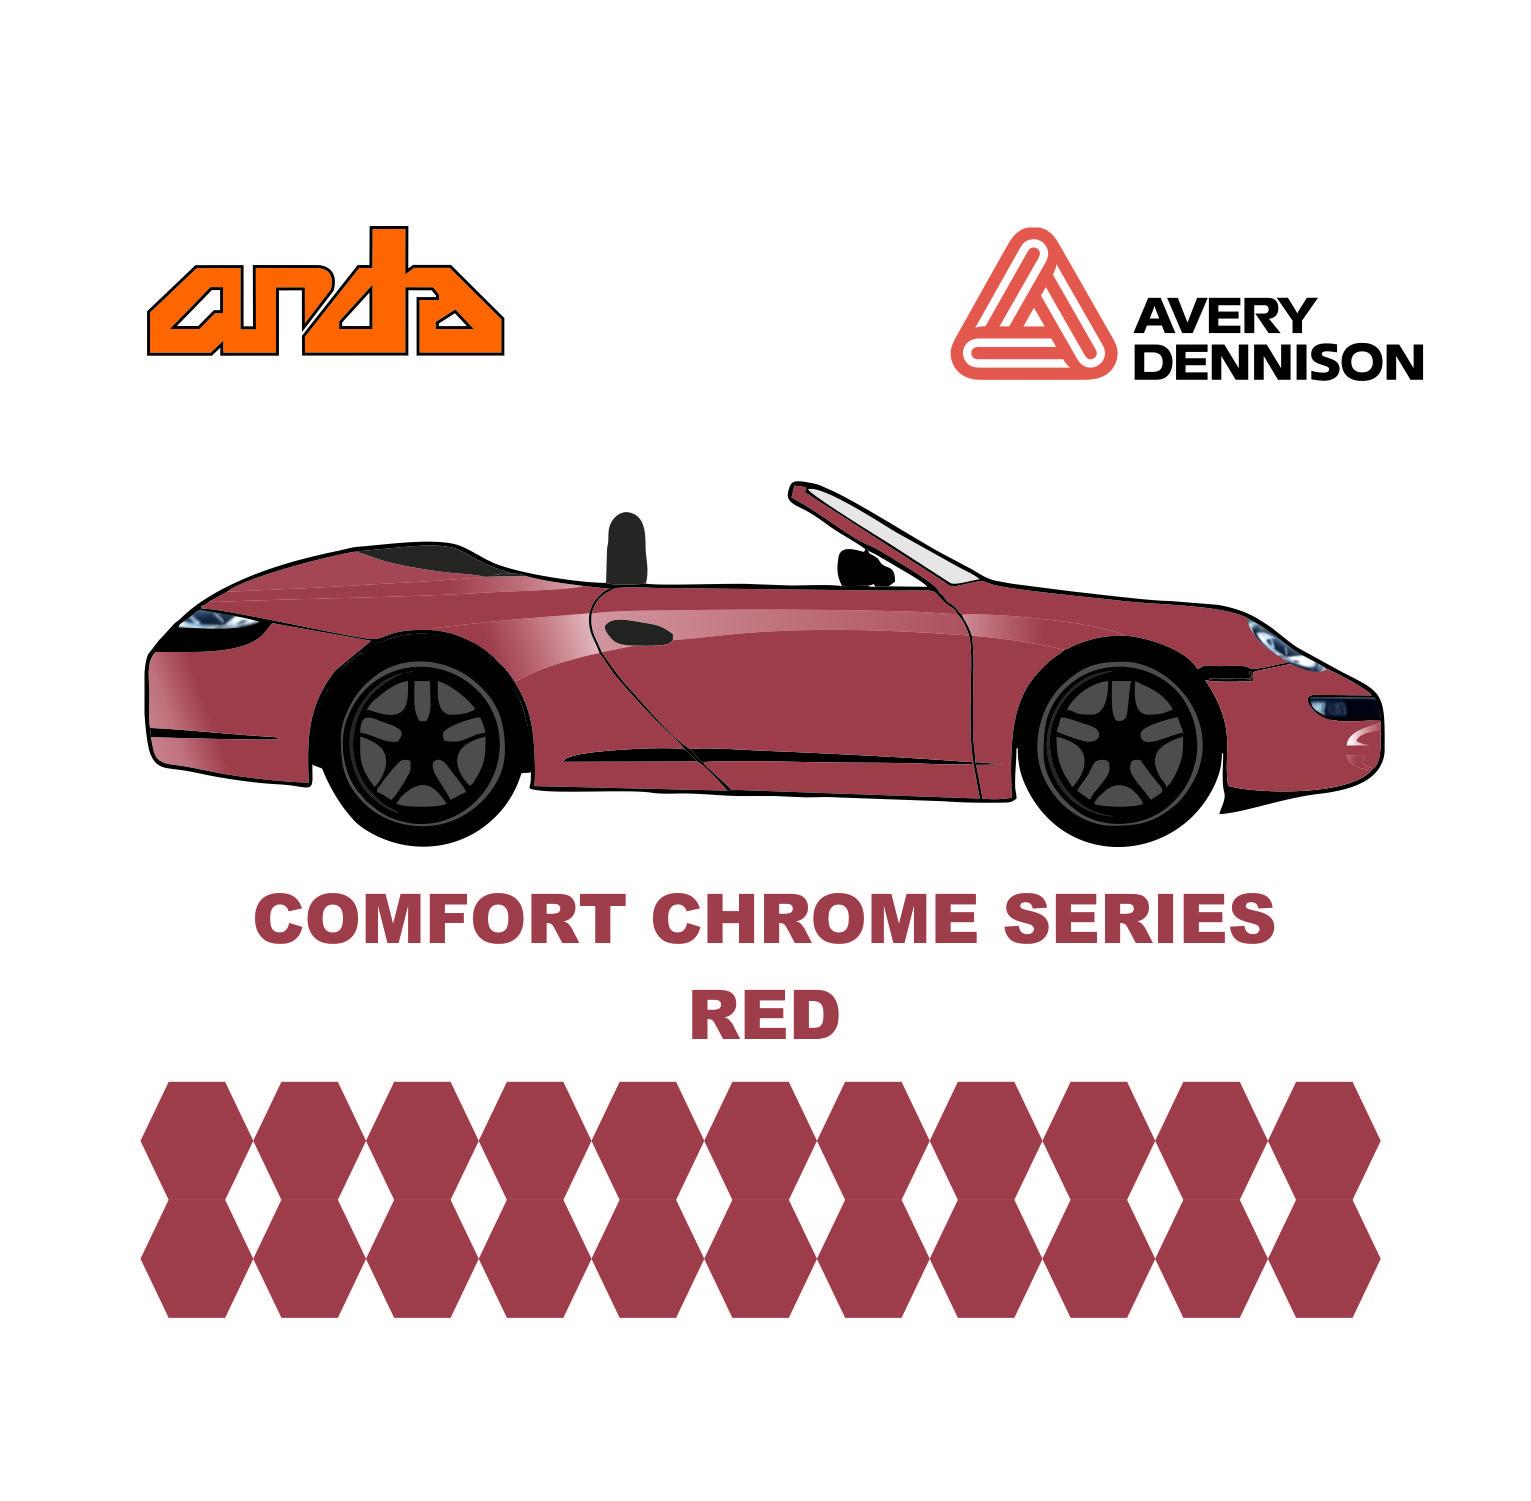 Avery Dennison- SWF Comform Chrome Red 1